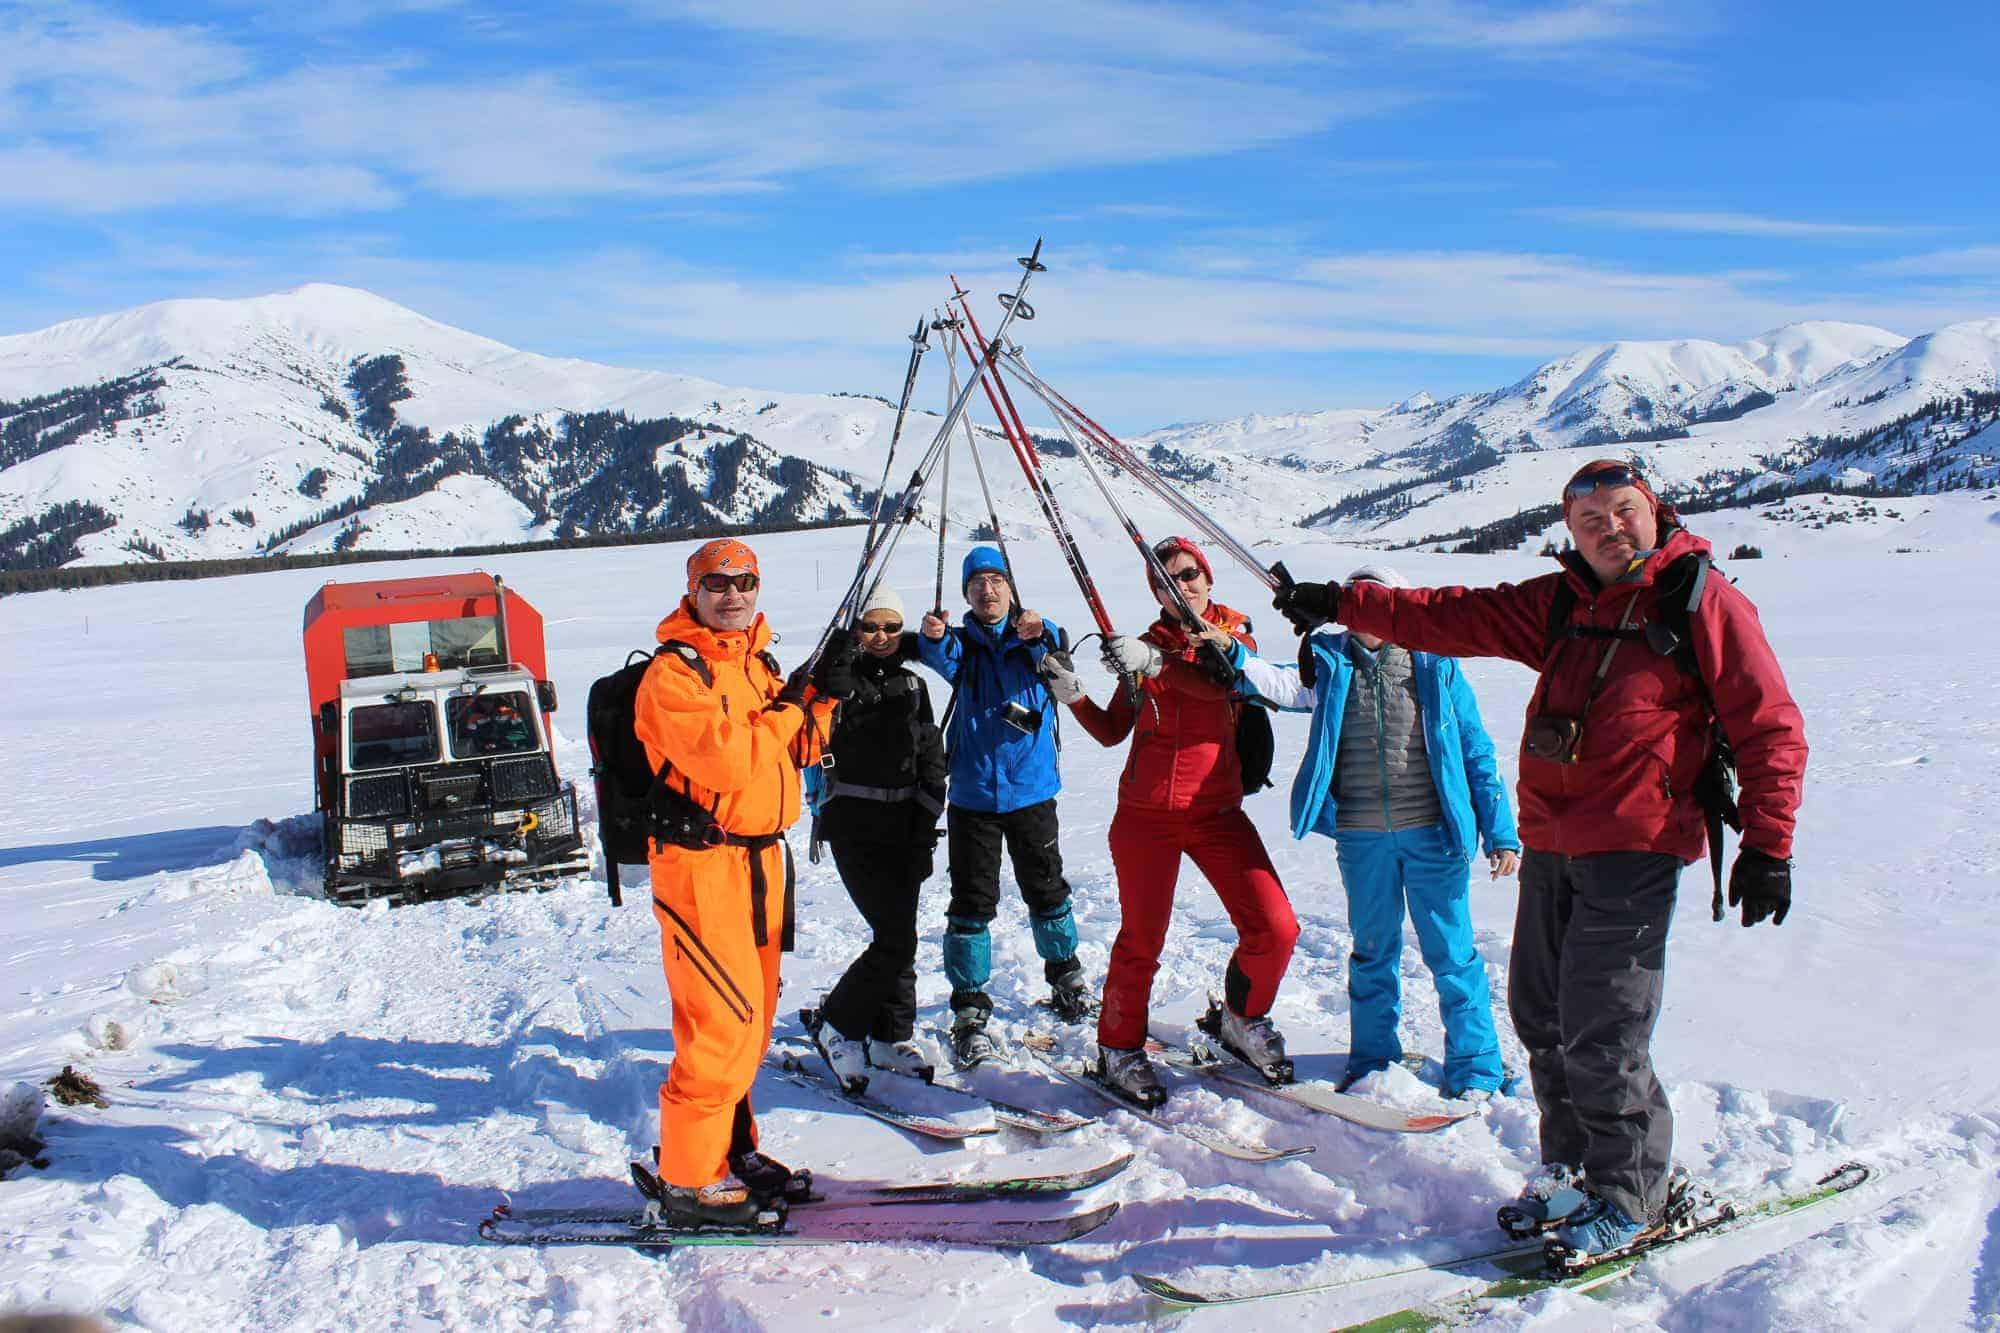 Jyrgalan Winter Sports